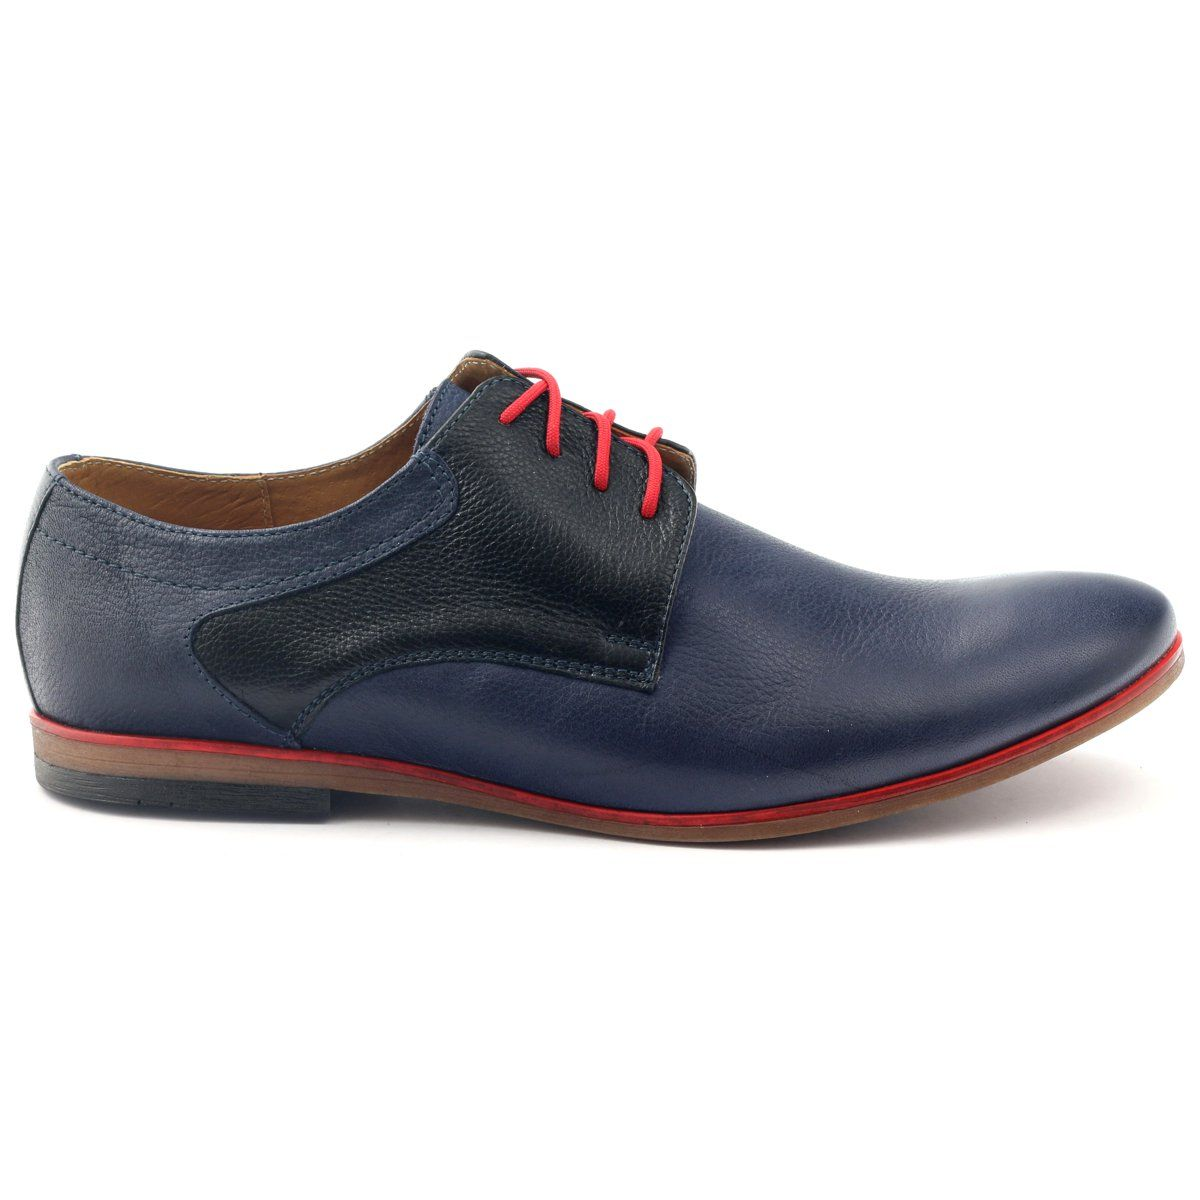 Polbuty Meskie Moskala H 5 Granatowe Czarne Czerwone Mens Casual Shoes Shoes Mens Shoes